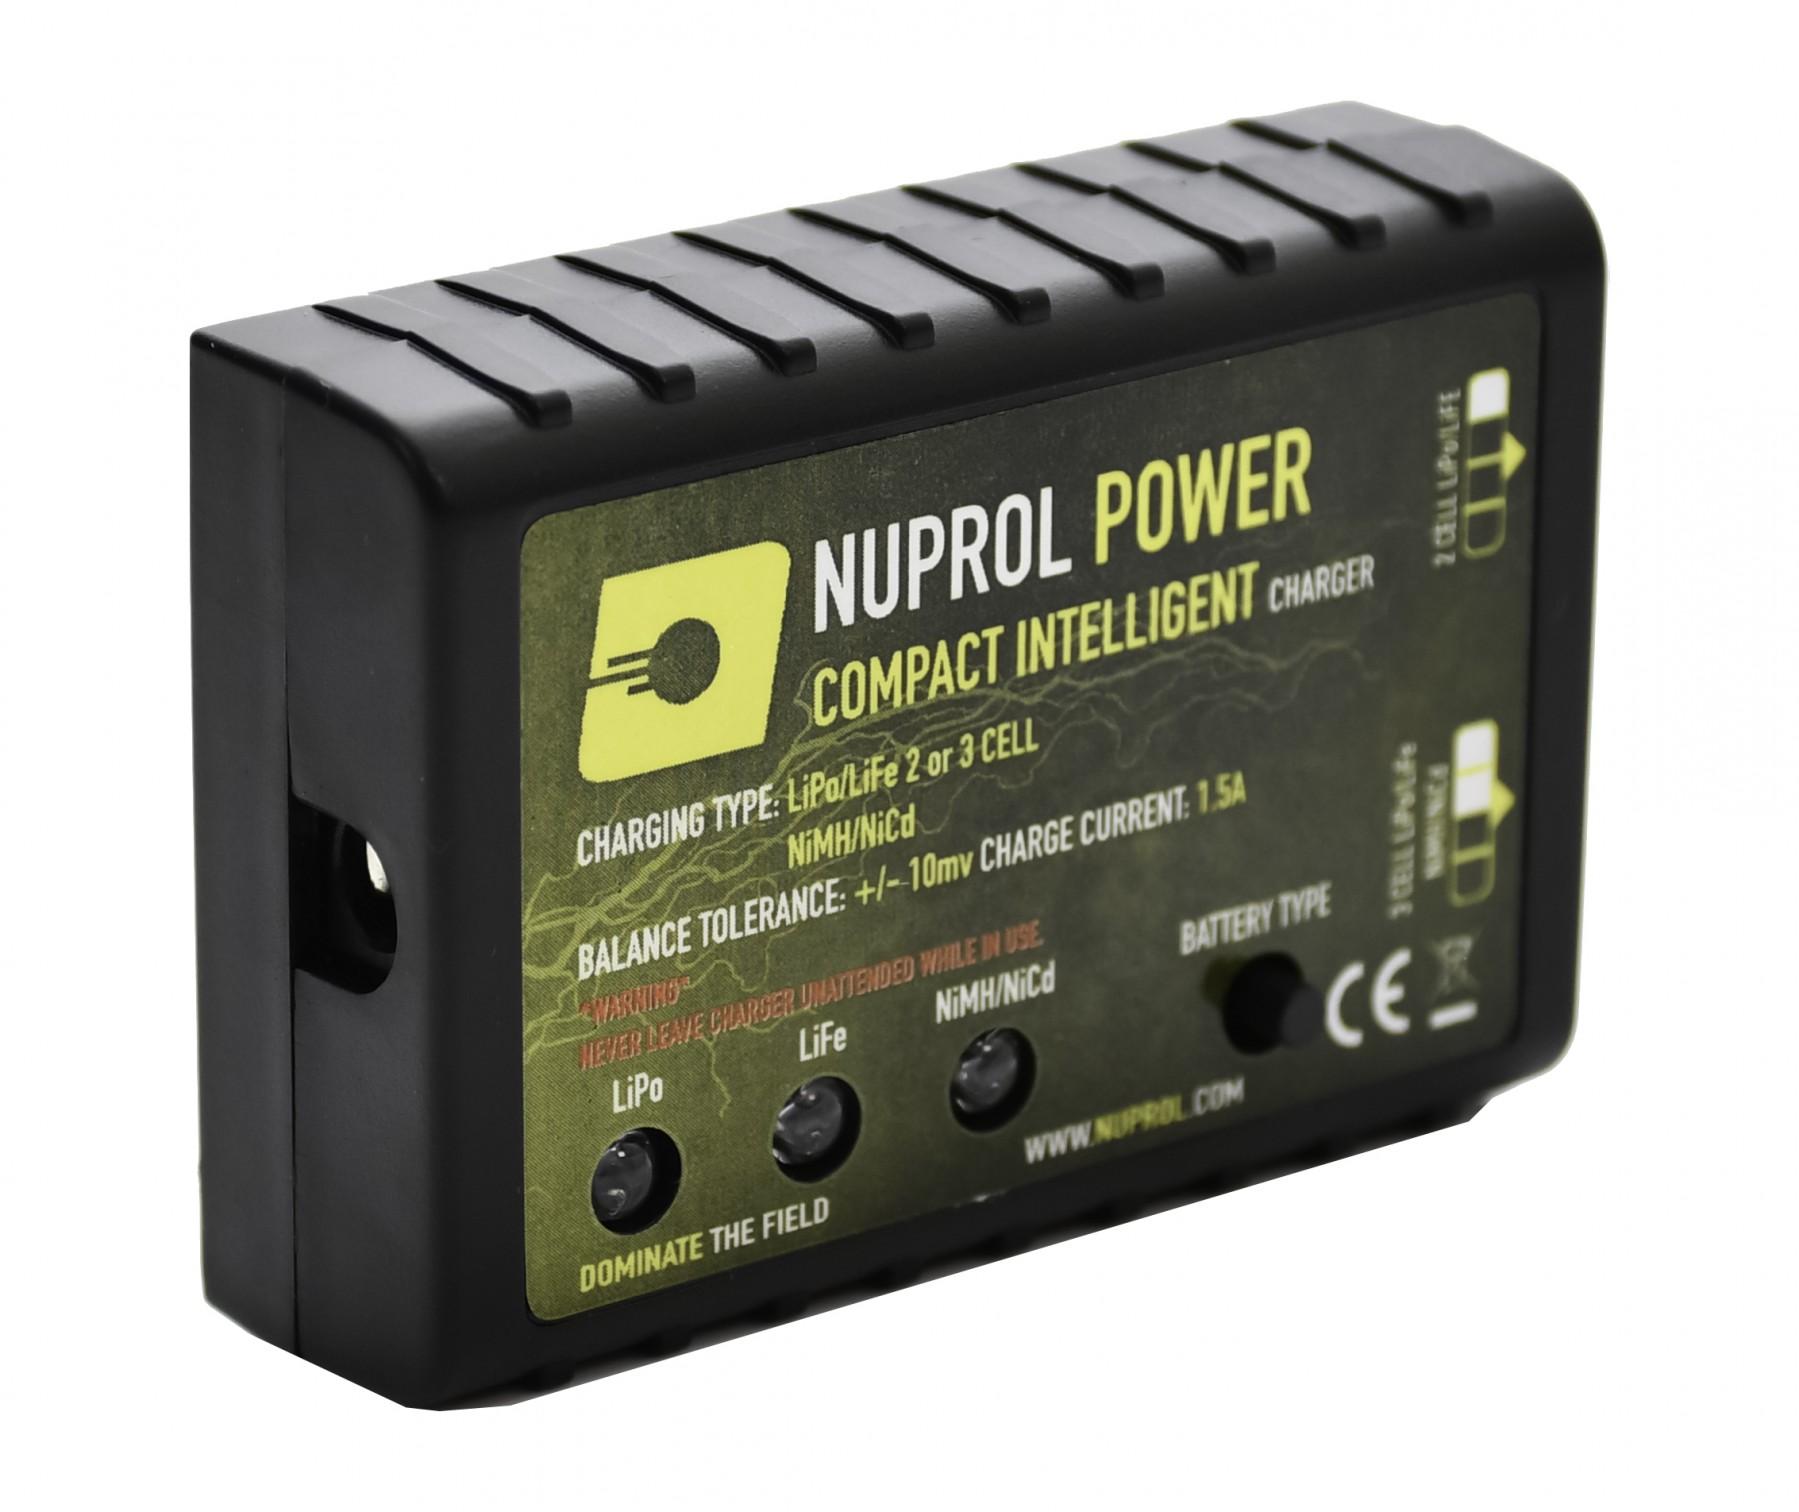 NUPROL COMPACT LIPO BALANCE CHARGER product image